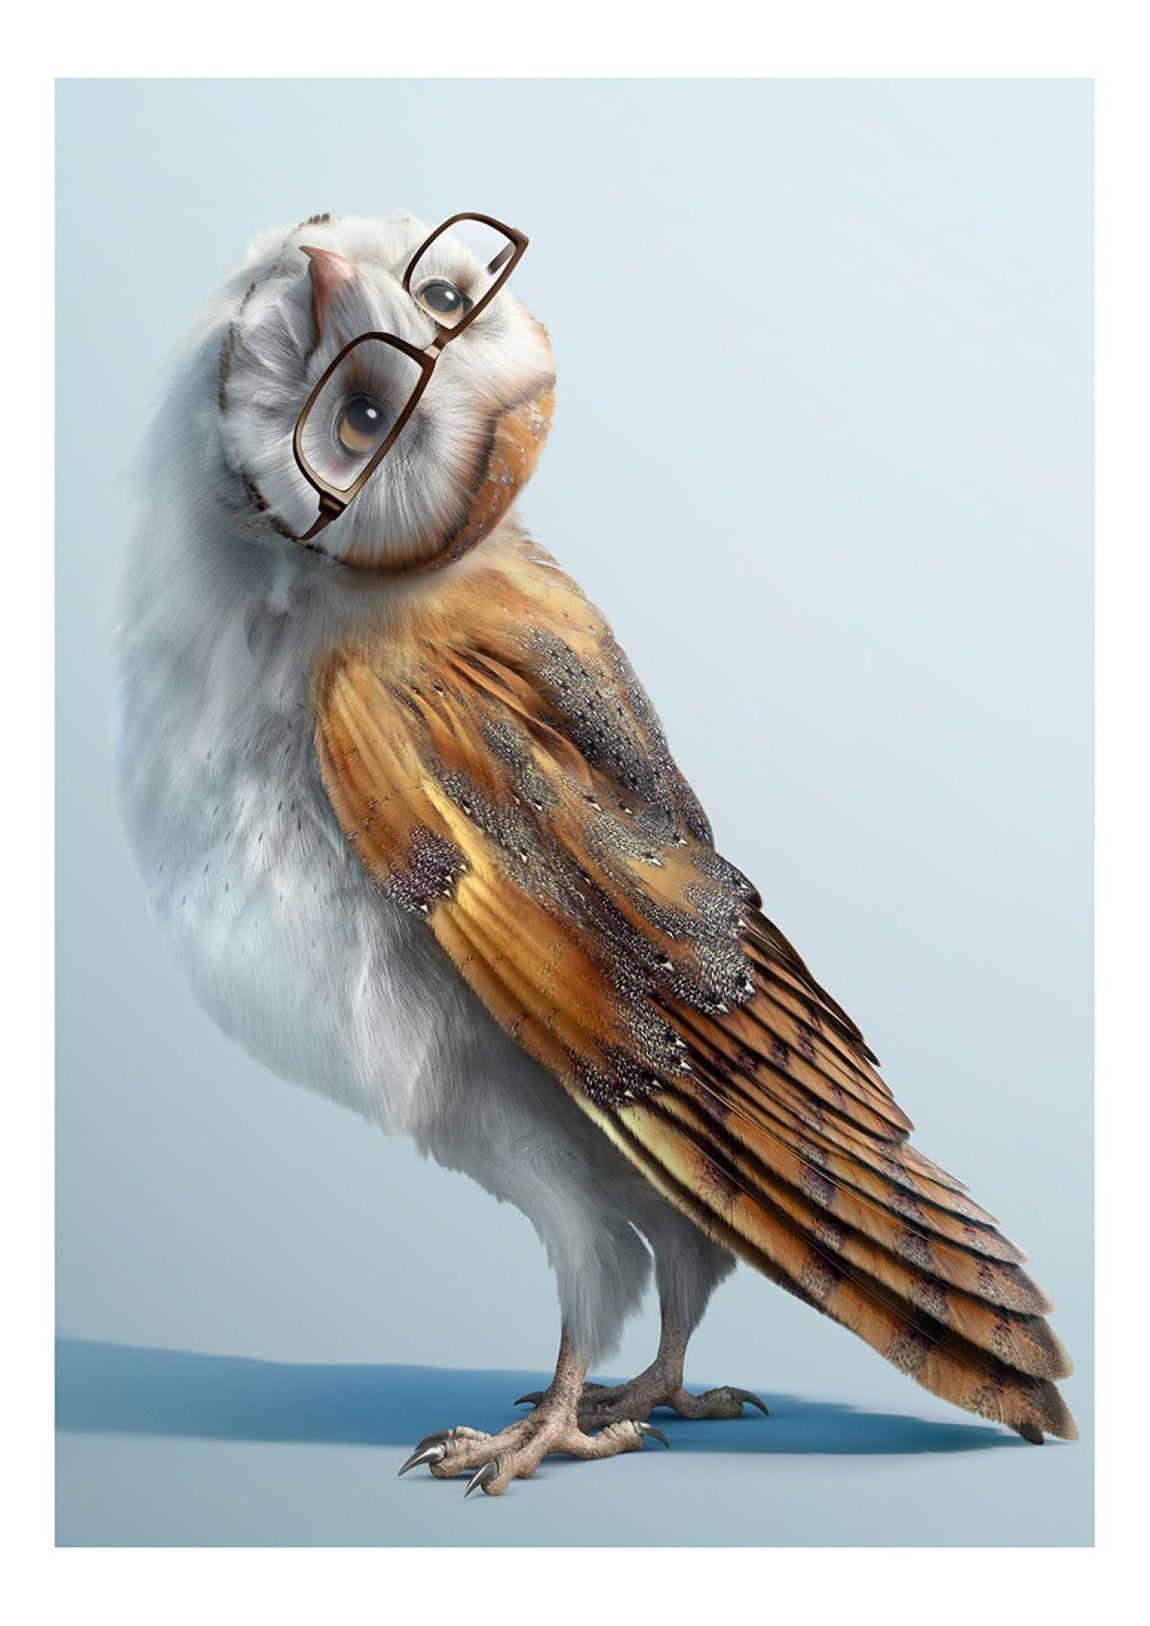 Lürzer's Archive - Digital Artist - Selection 1 on Behance